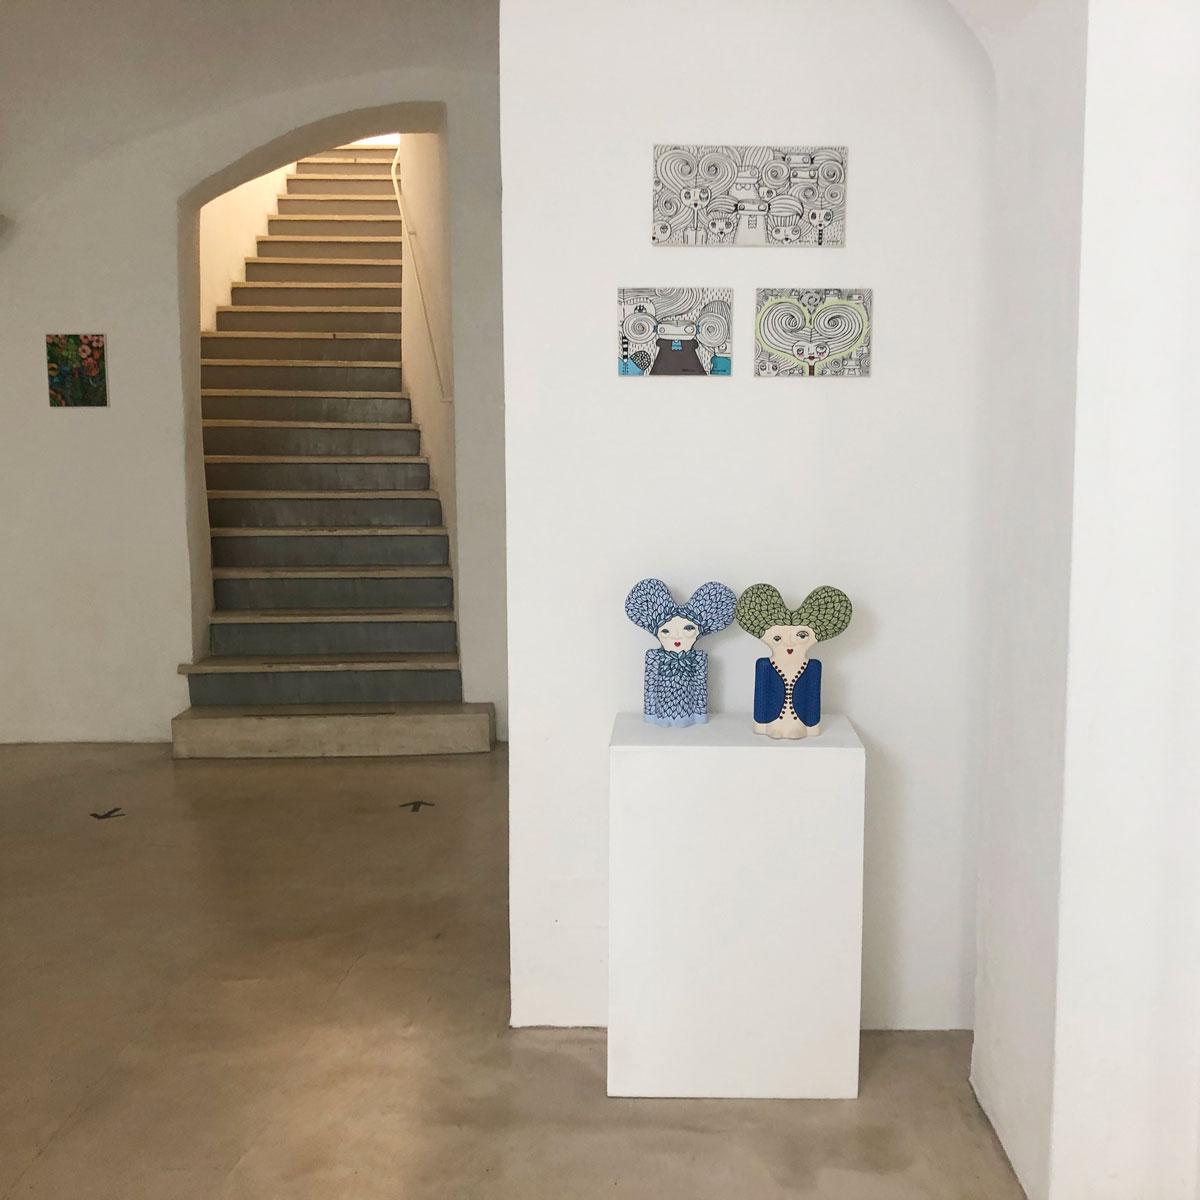 Downstair-Salmistraro-2-ok